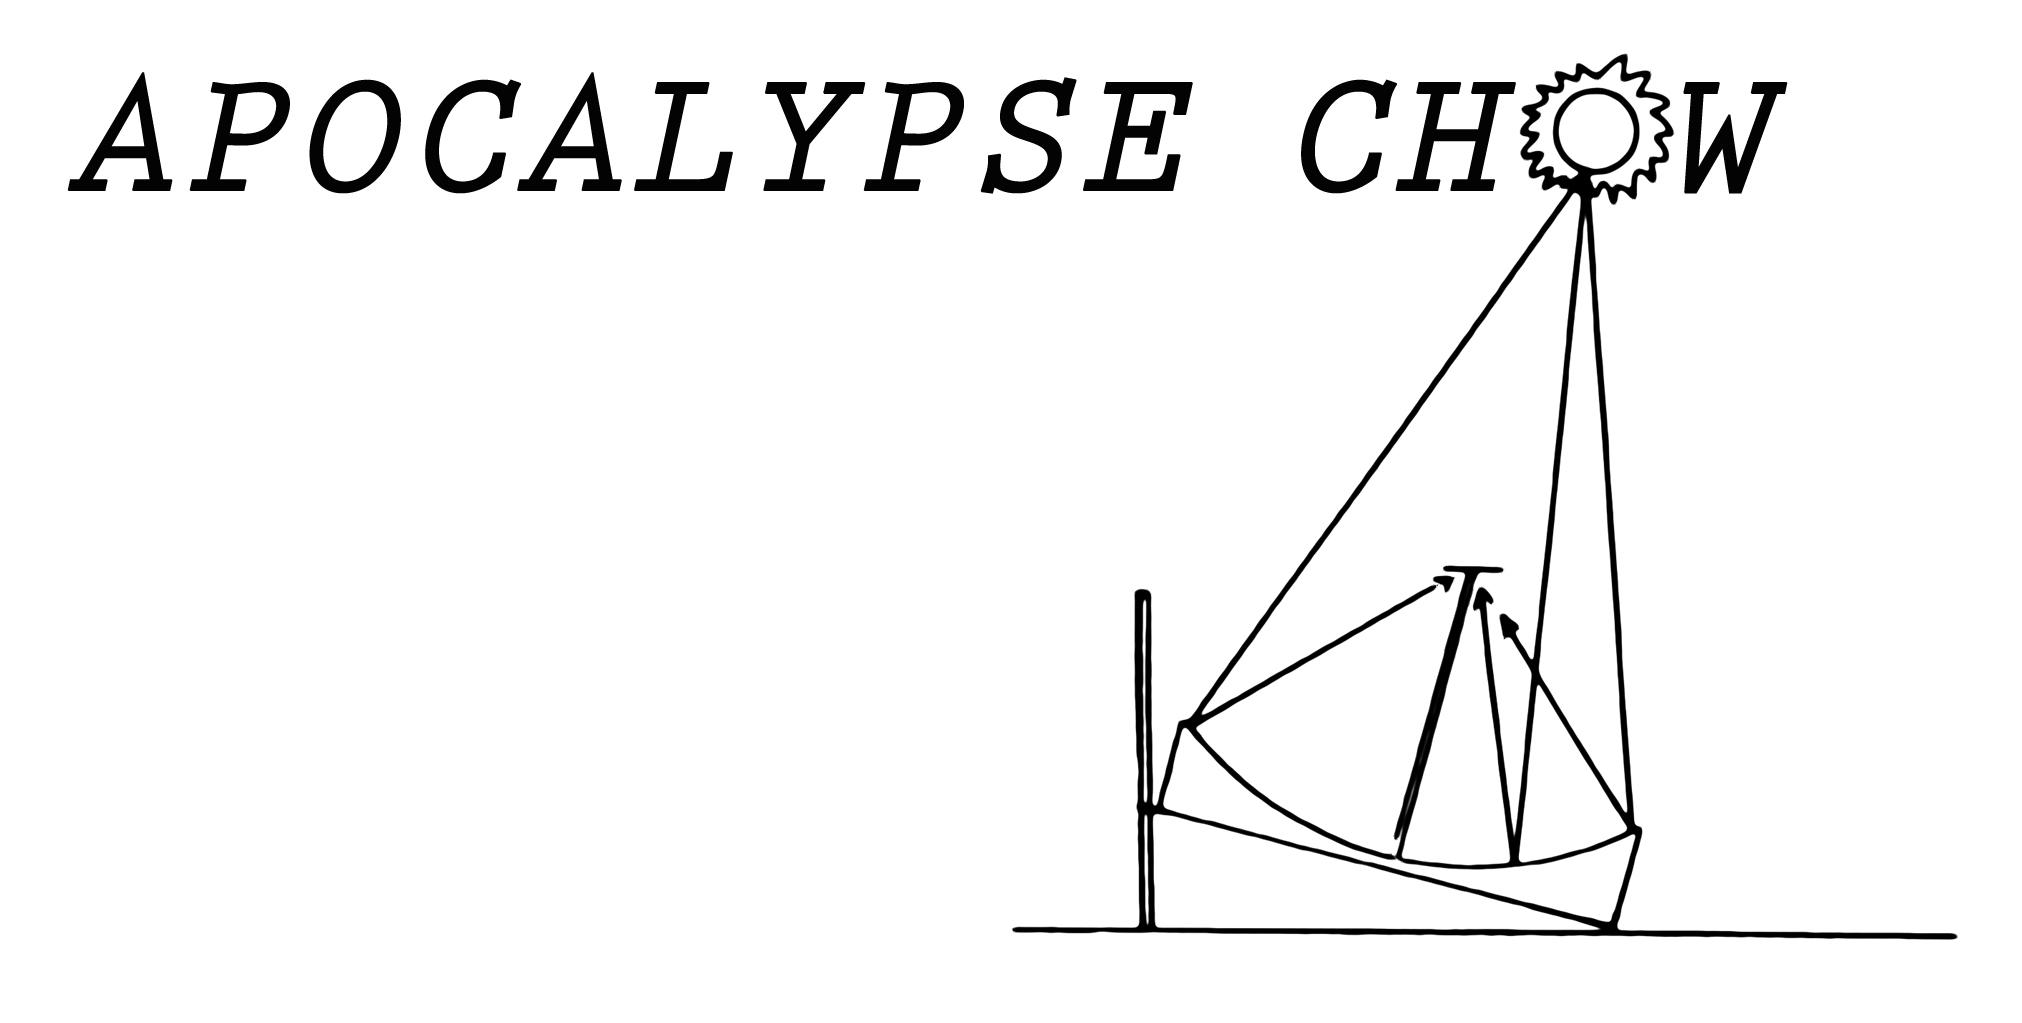 Apocalypse Chow